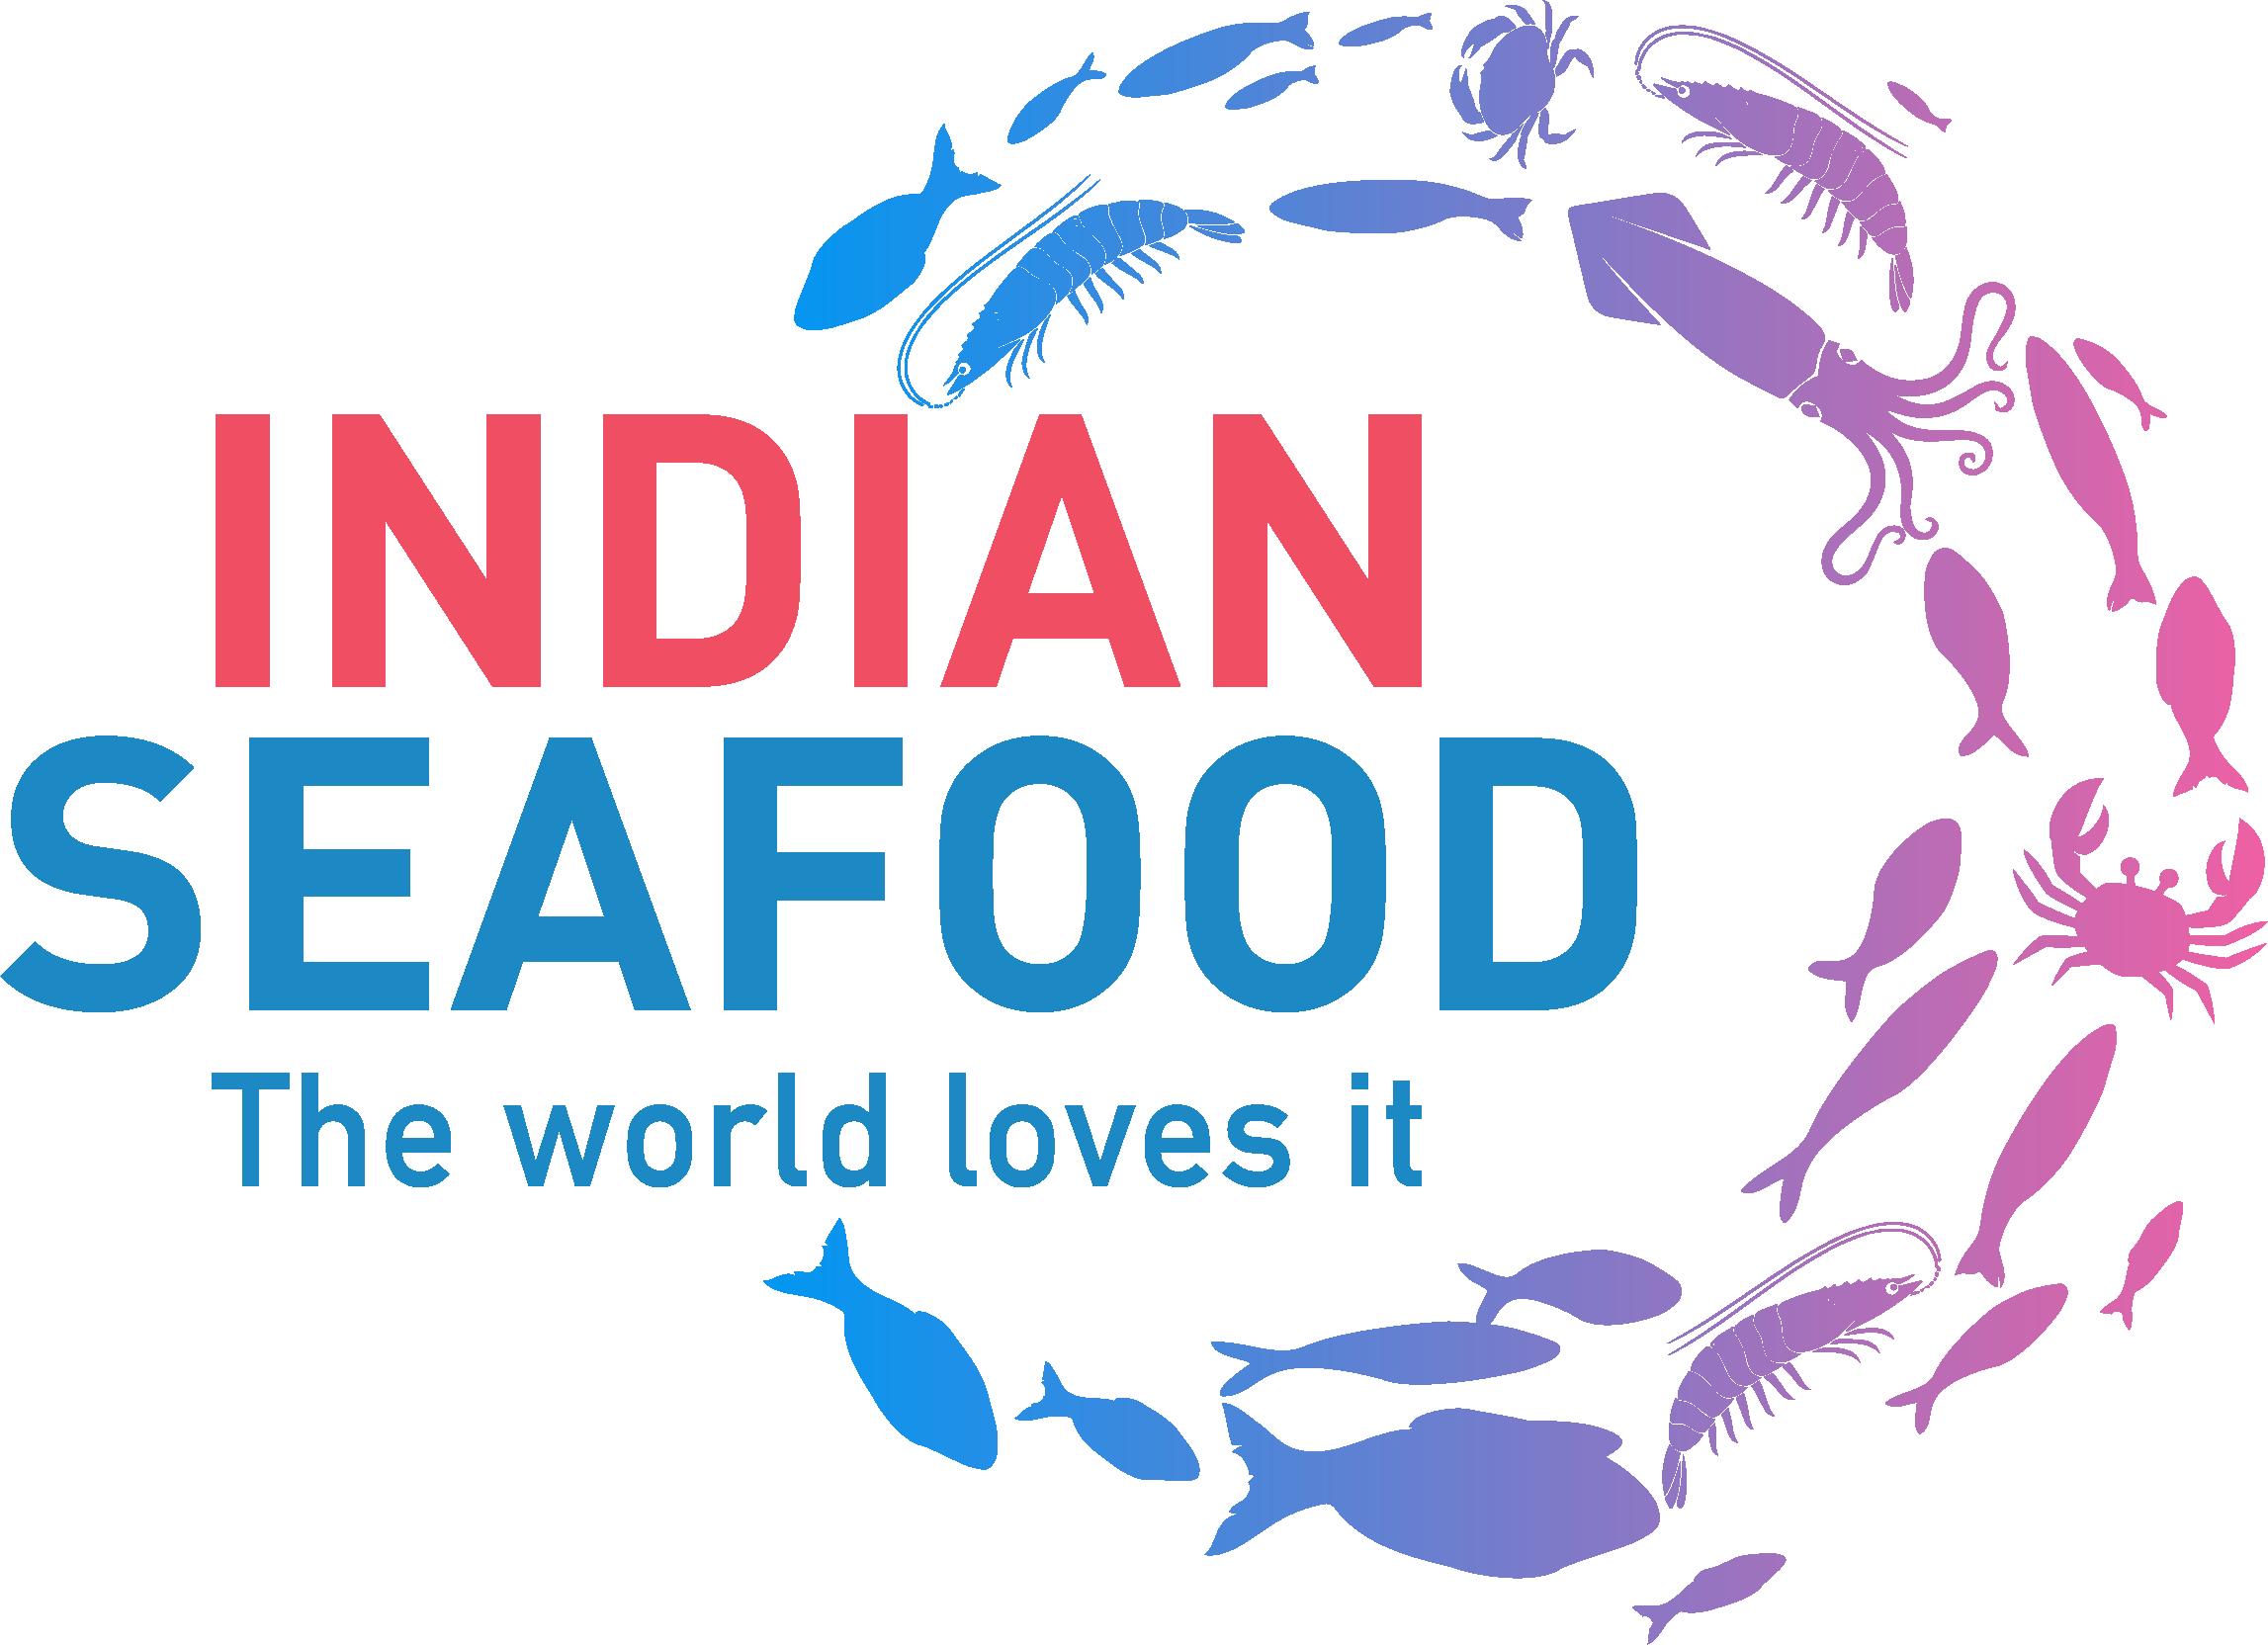 INDIAN SEAFOOD